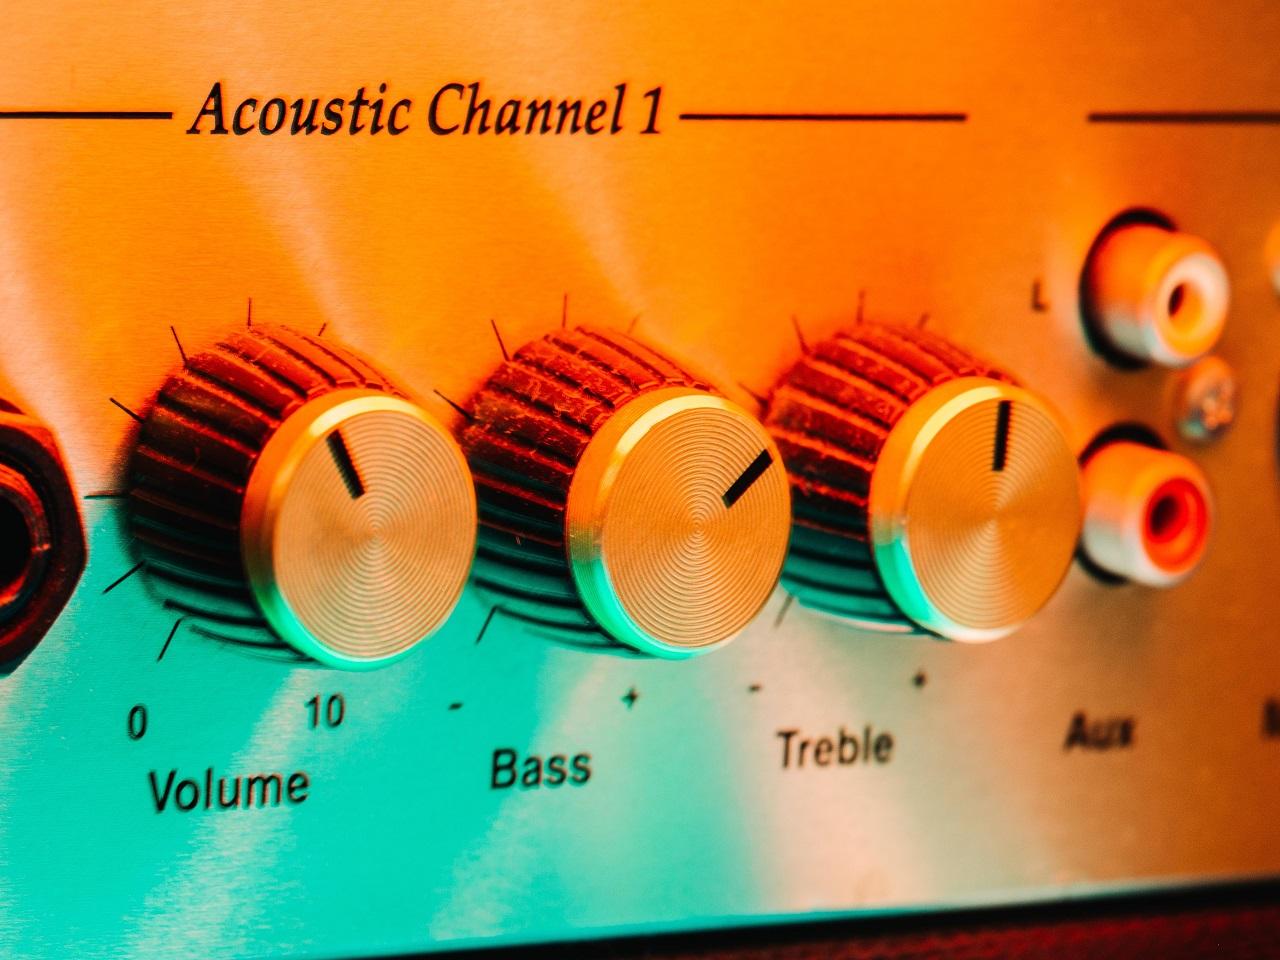 Amp controls - Volume, Bass, Treble. Photo by Ash Edmonds on Unsplash